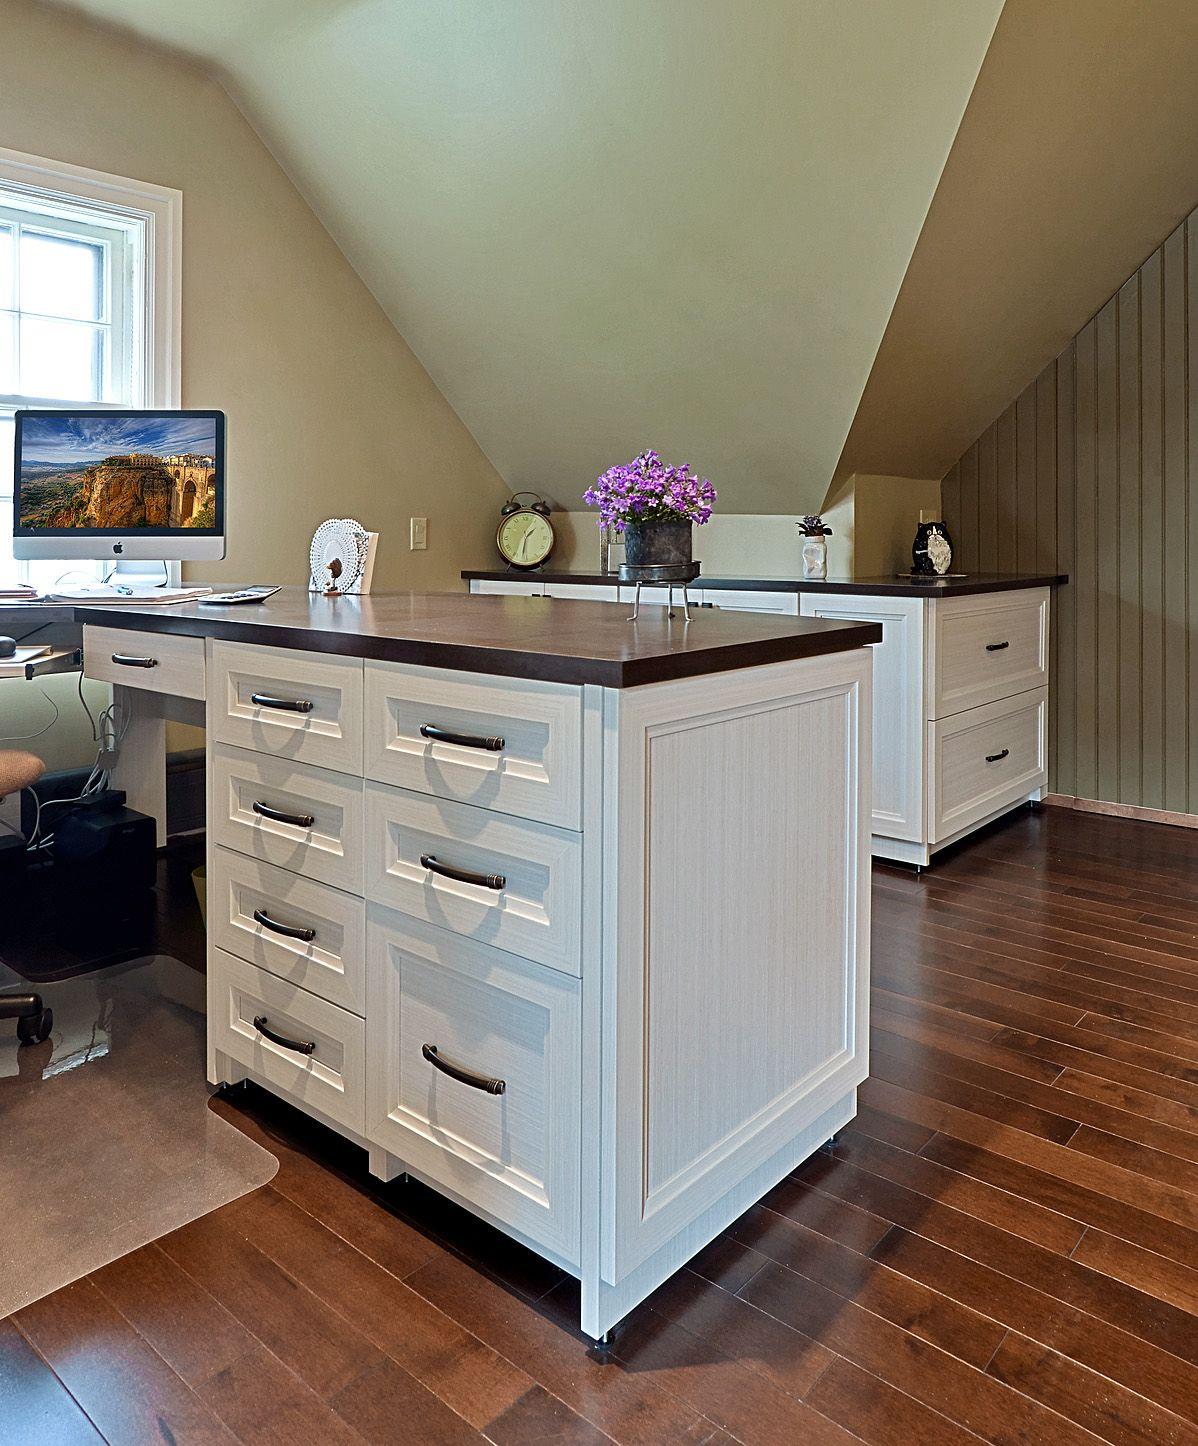 Get Home Design Ideas: Custom Home Office Design Ideas & Storage Solutions